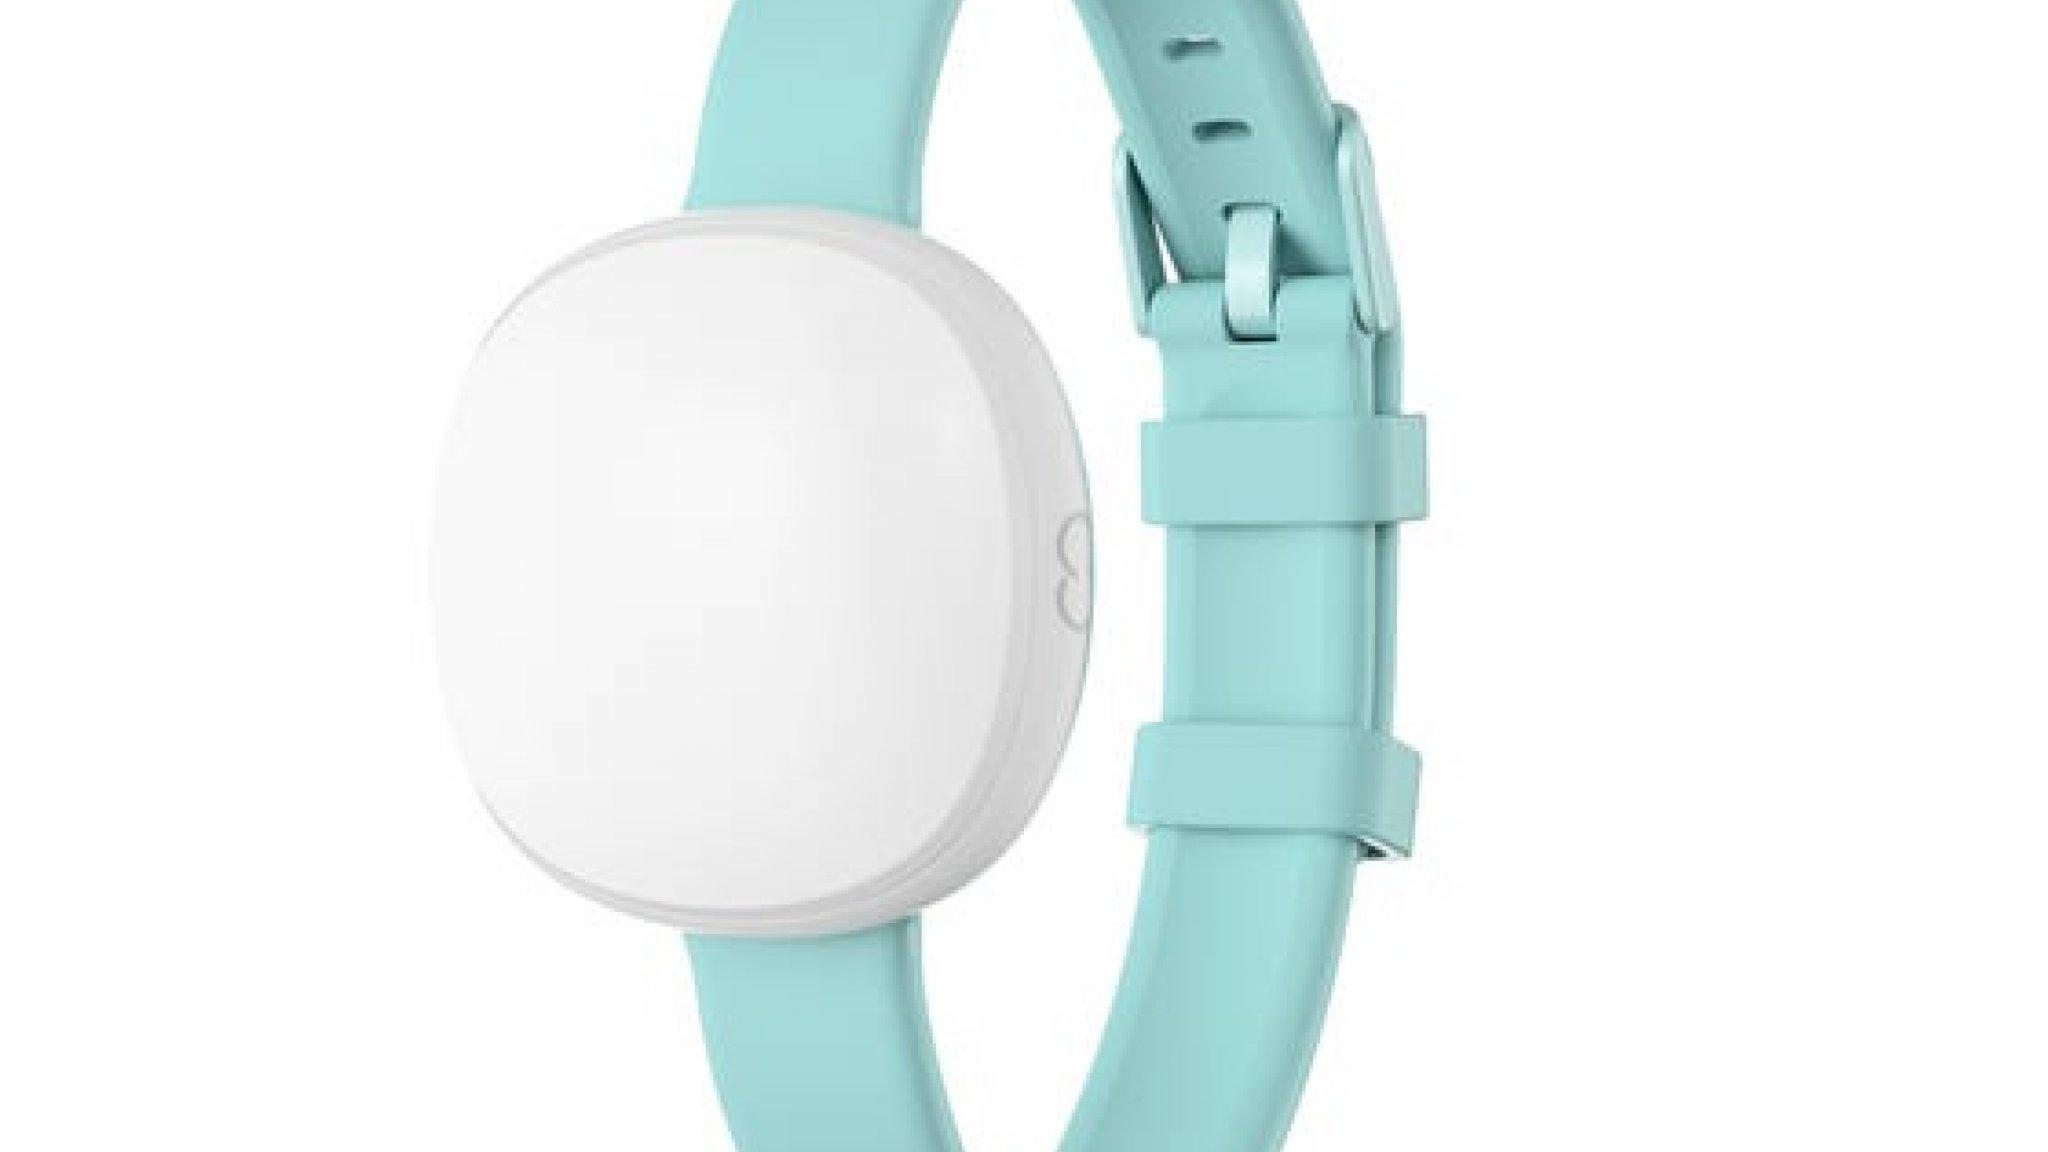 UMC tests the smart bracelet that detects Corona earlier